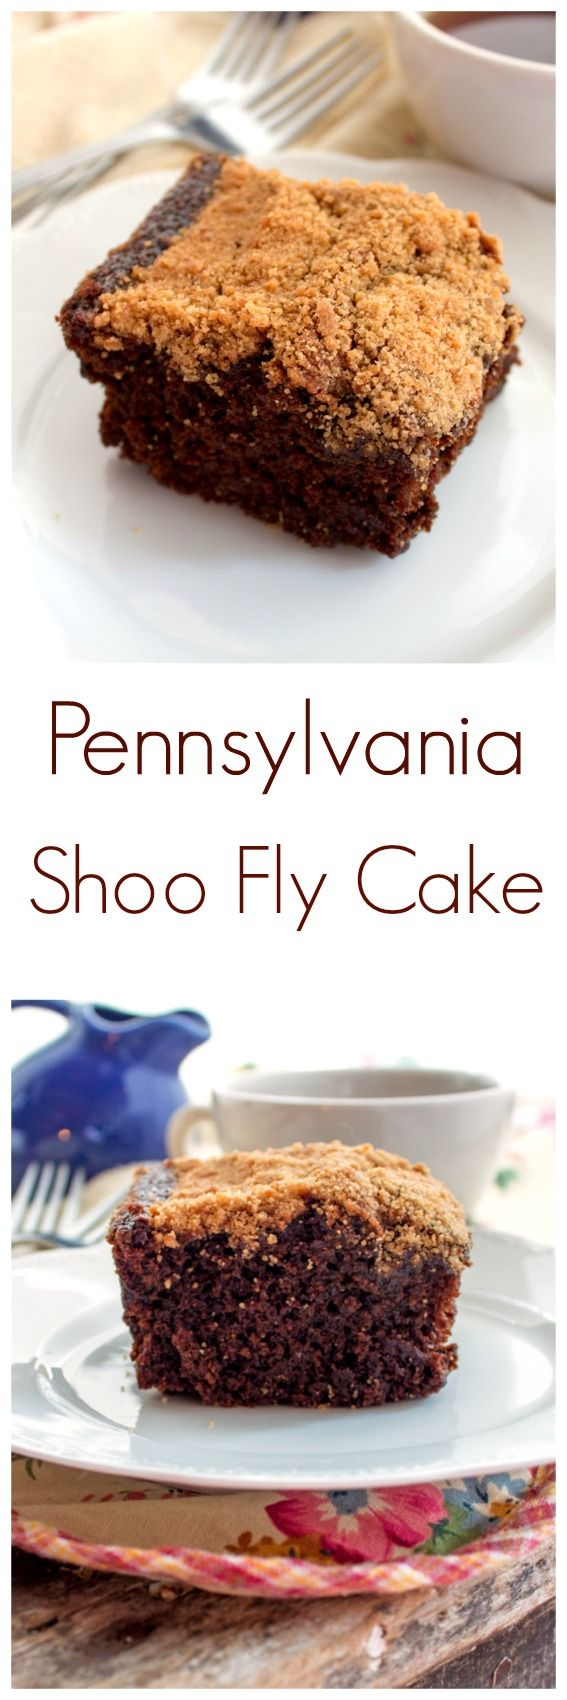 Pennsylvania Shoo Fly Cake via…